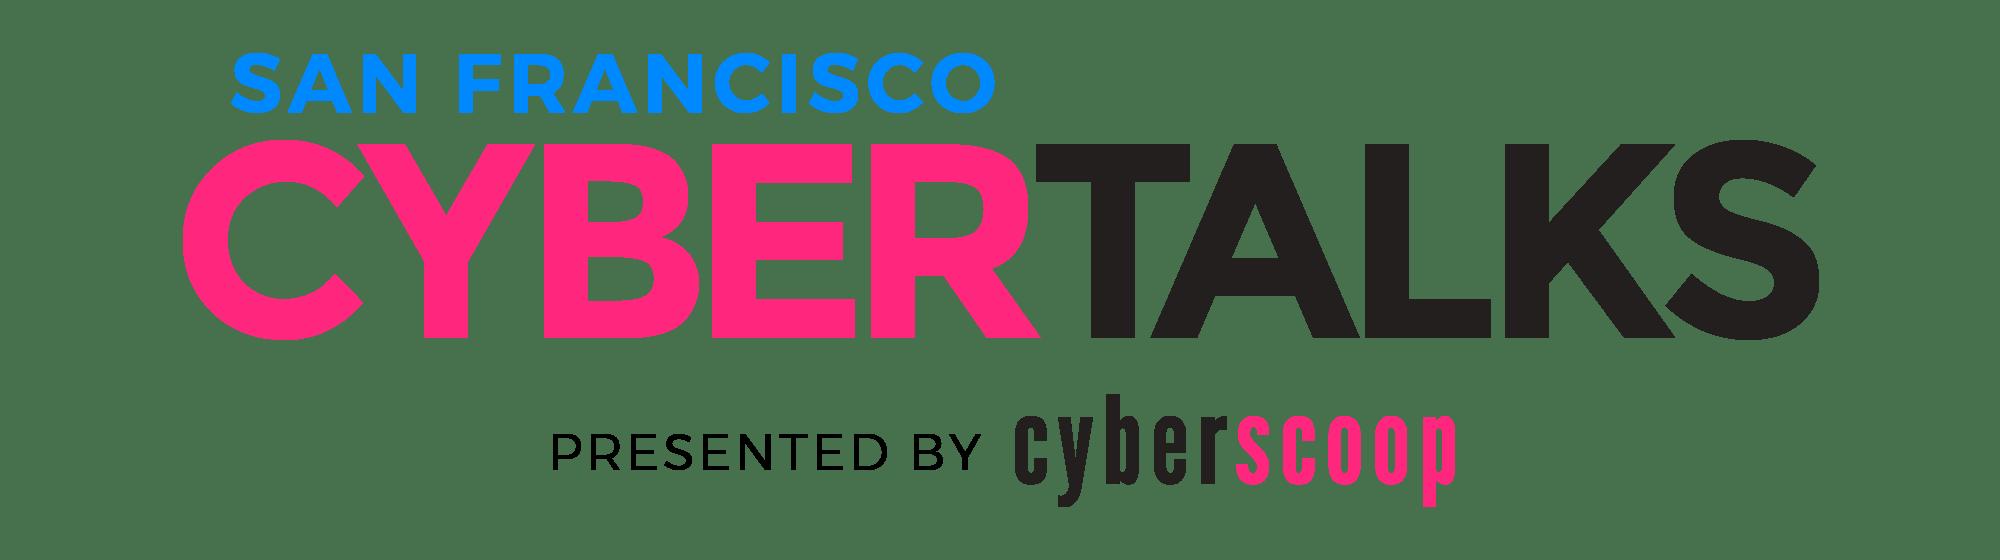 2018 San Francisco CYBERTALKS